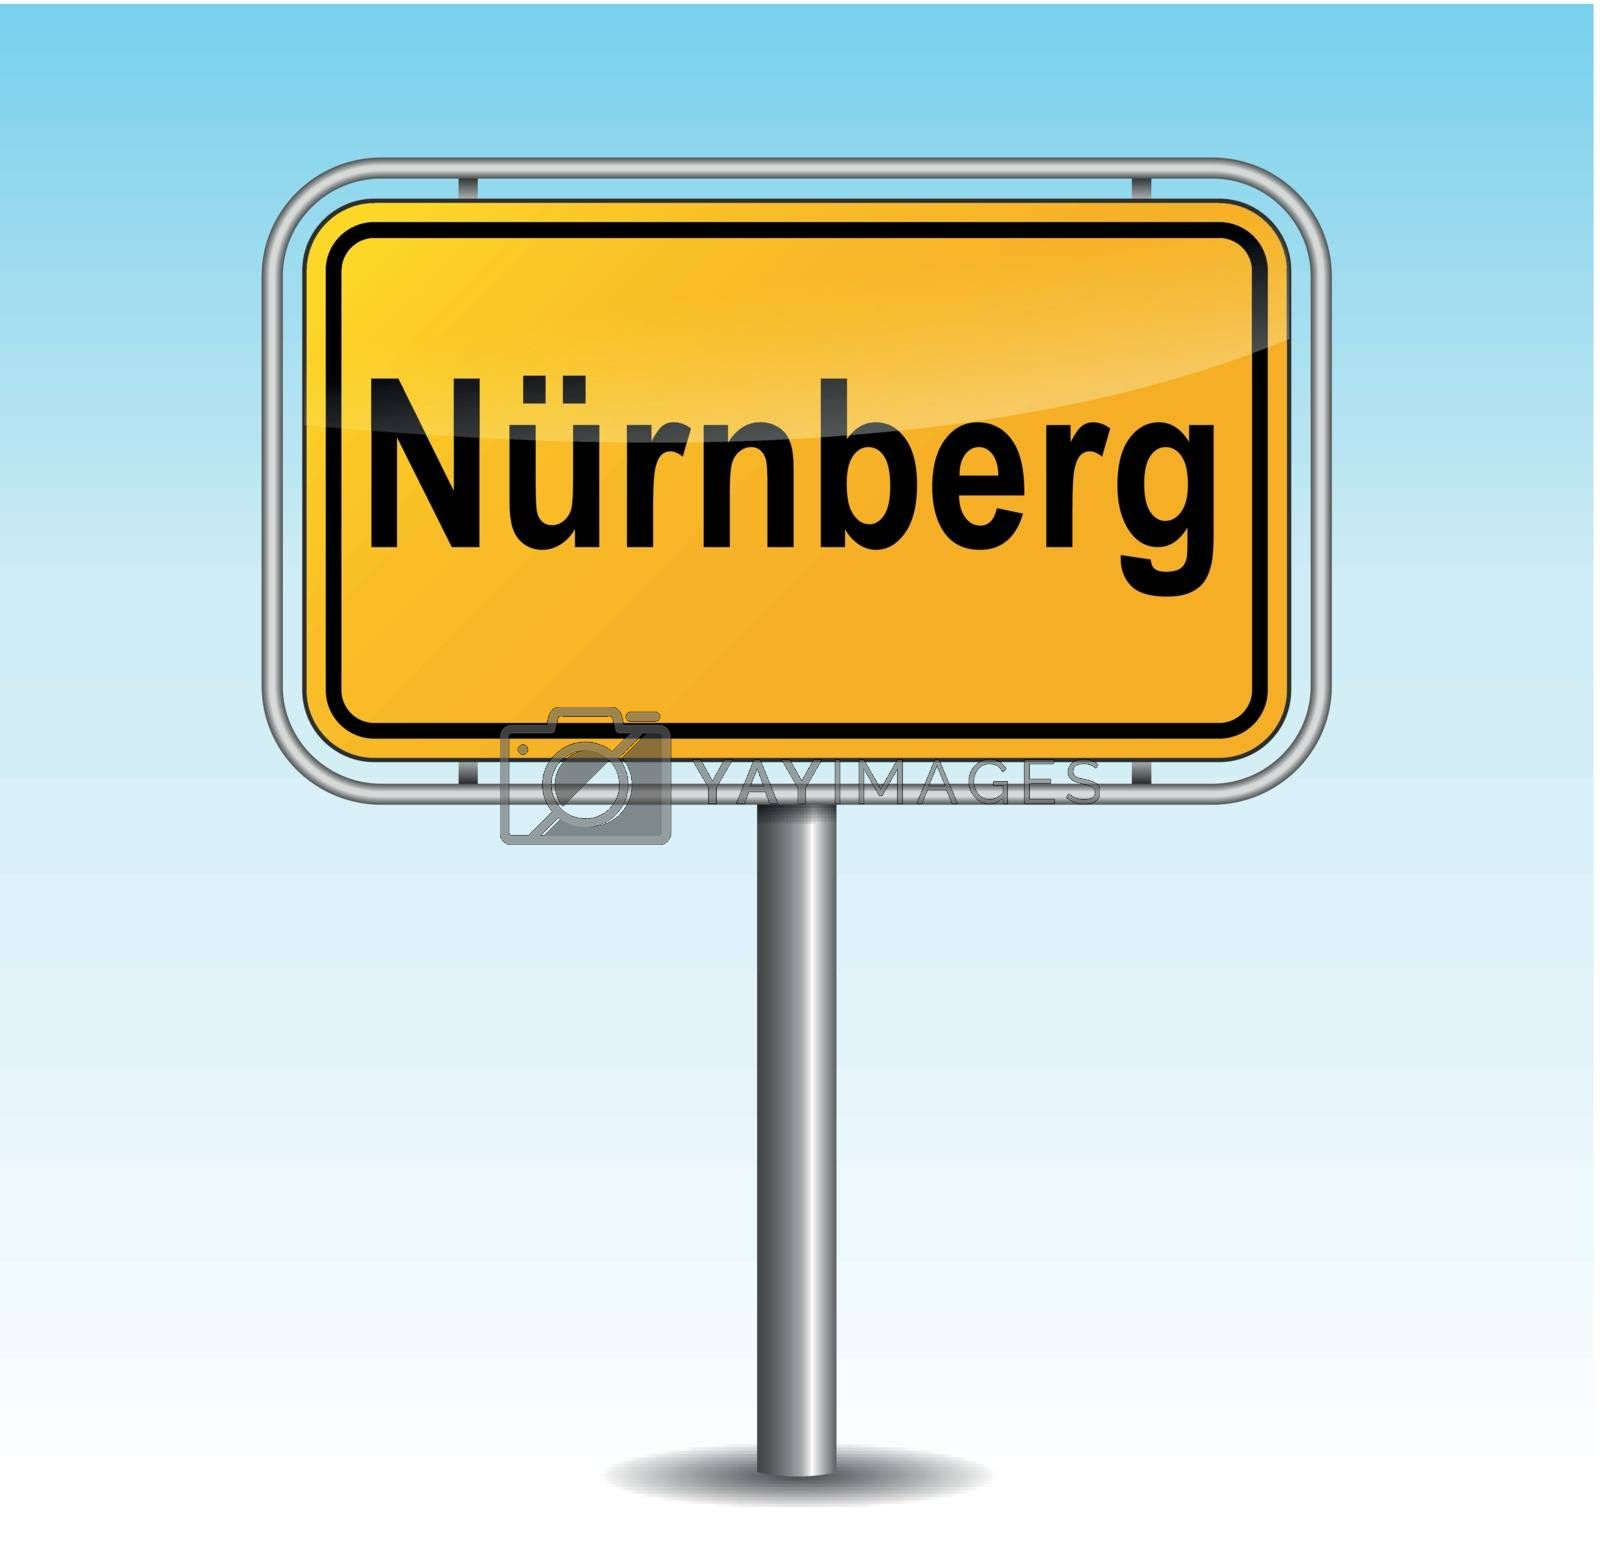 Vector nuremberg signpost by nickylarson974